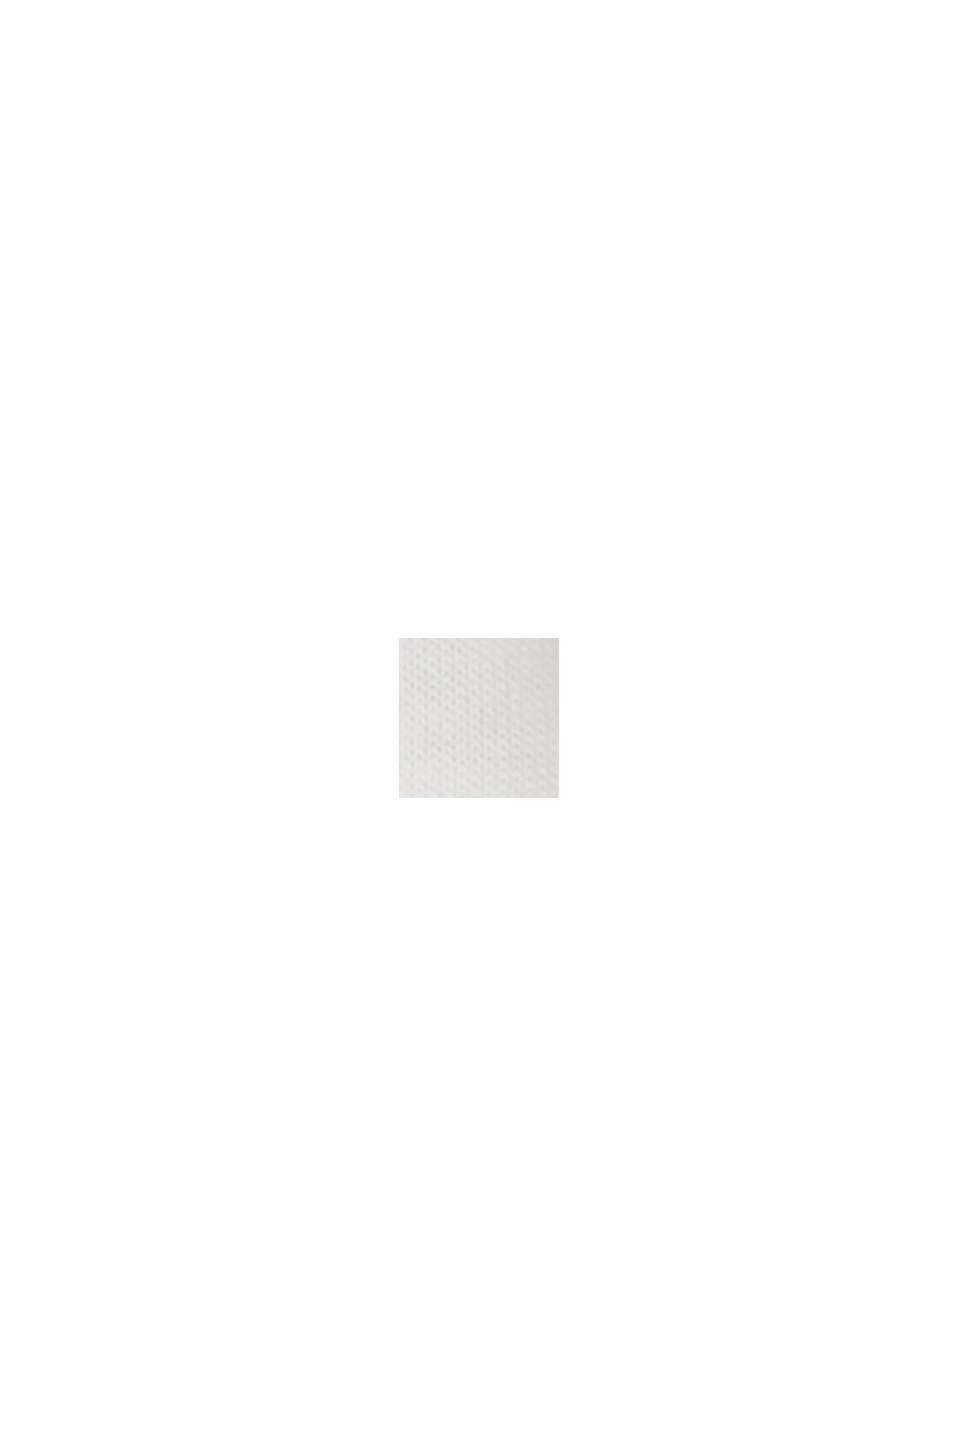 CURVY print T-shirt, organic cotton/TENCEL™, OFF WHITE, swatch